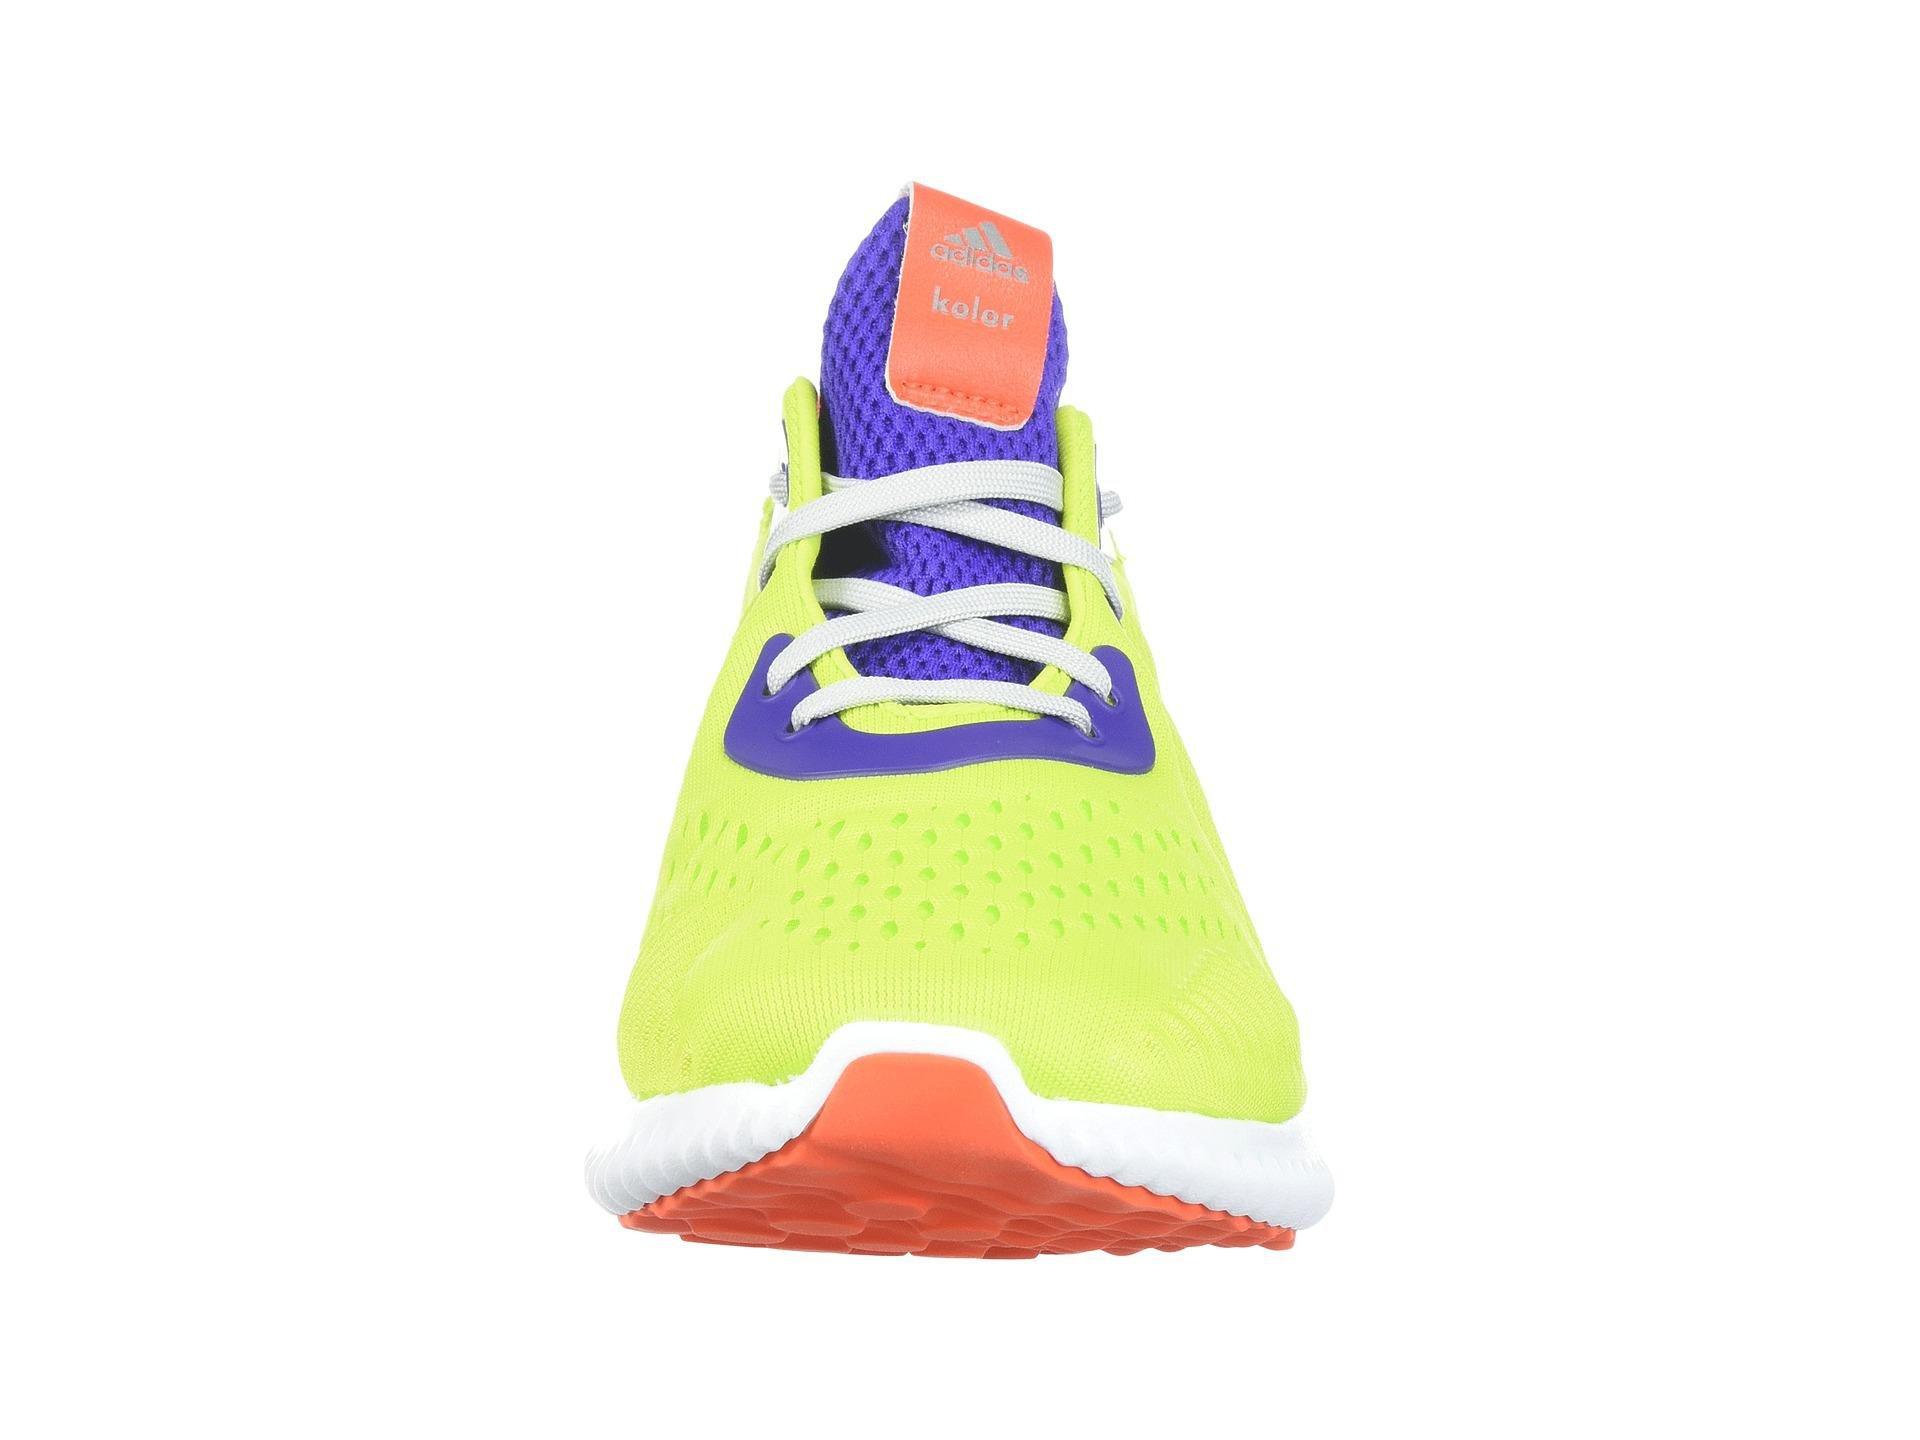 newest 1067f 4b732 Lyst - Adidas Originals Alphabounce 1 Kolor